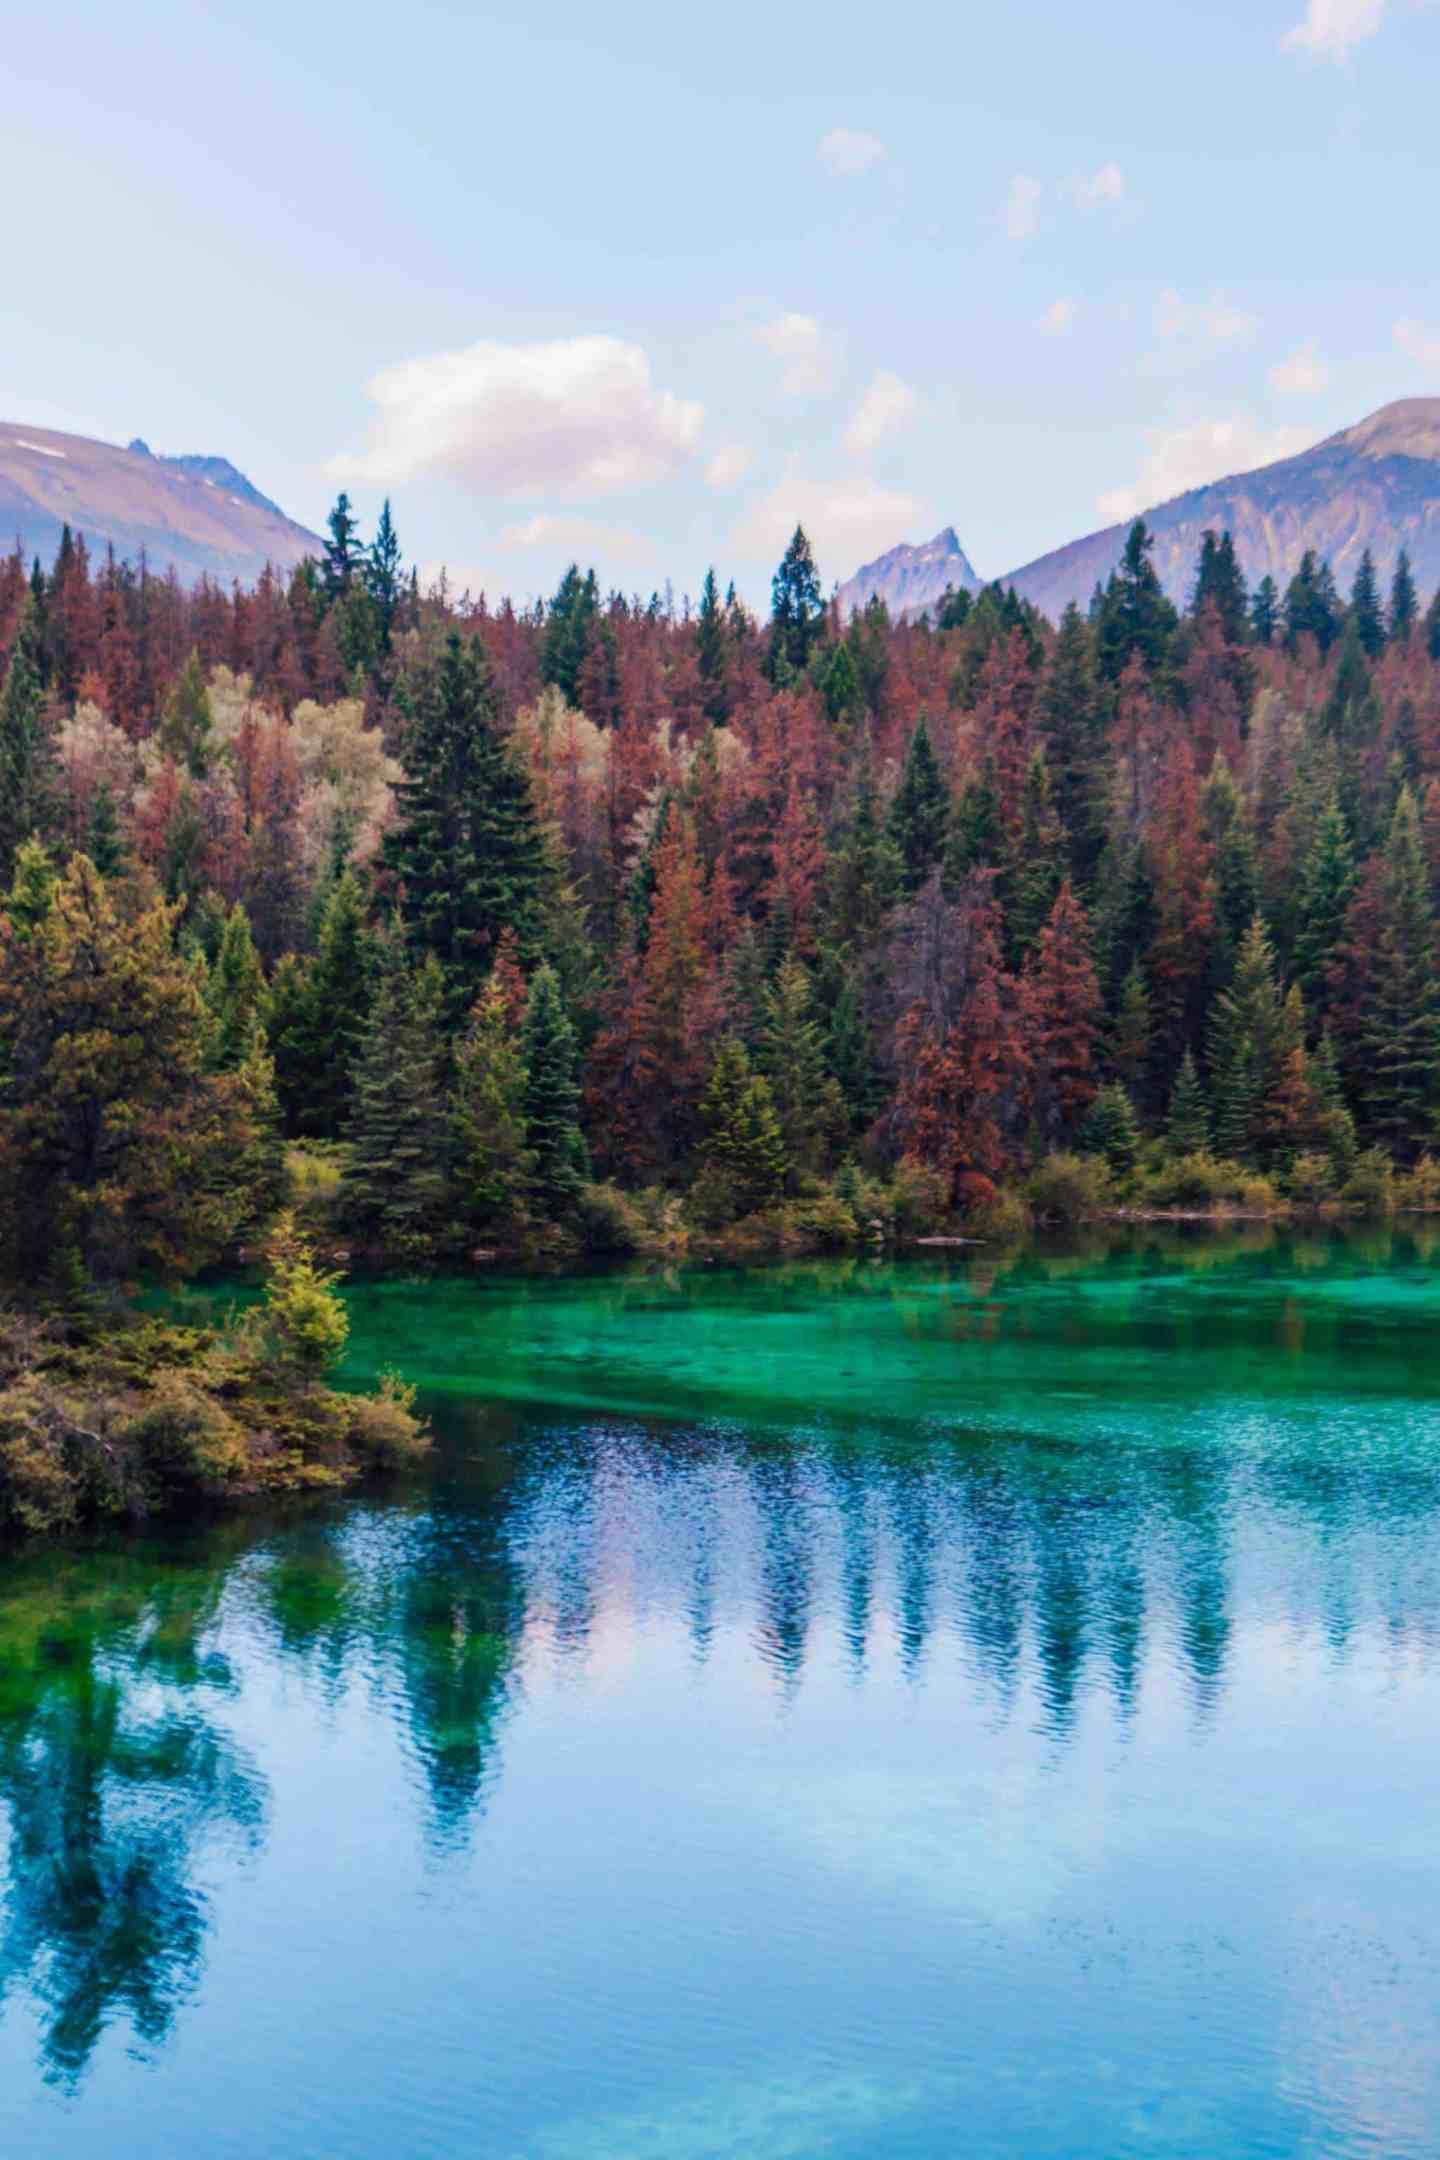 pine trees and alpine lakes